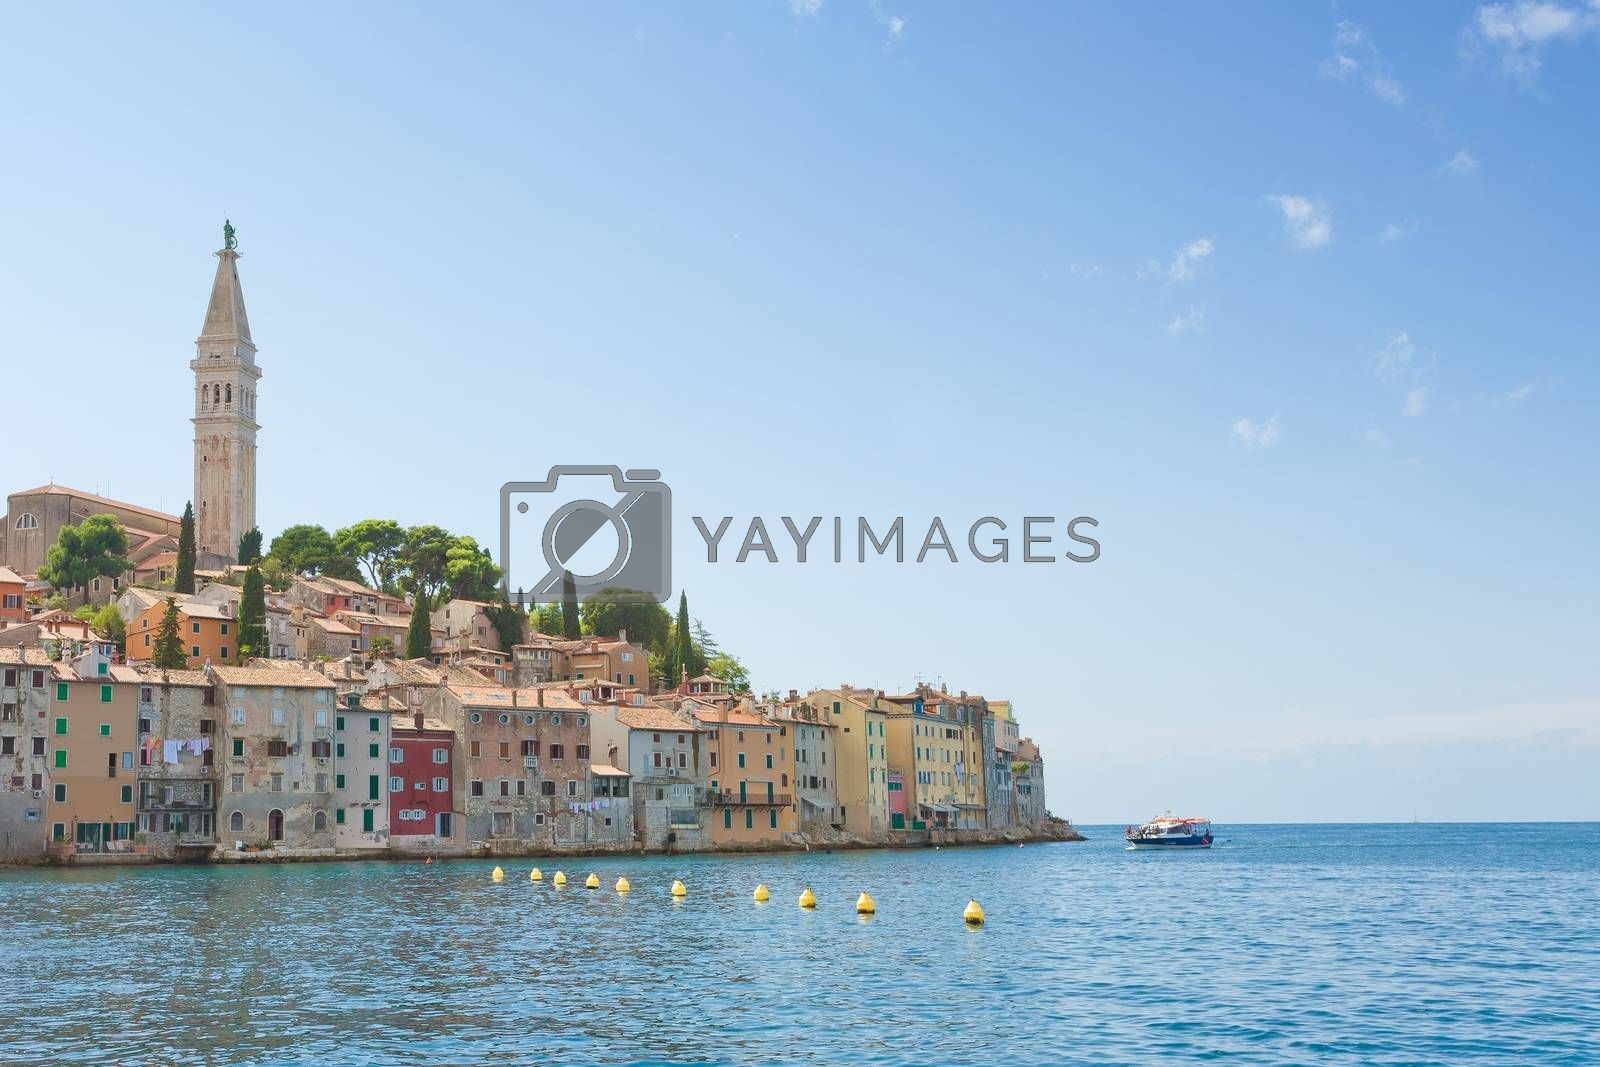 Rovinj, Istria, Croatia, Europe - Historic old town of Rovinj at the Mediterranean Sea